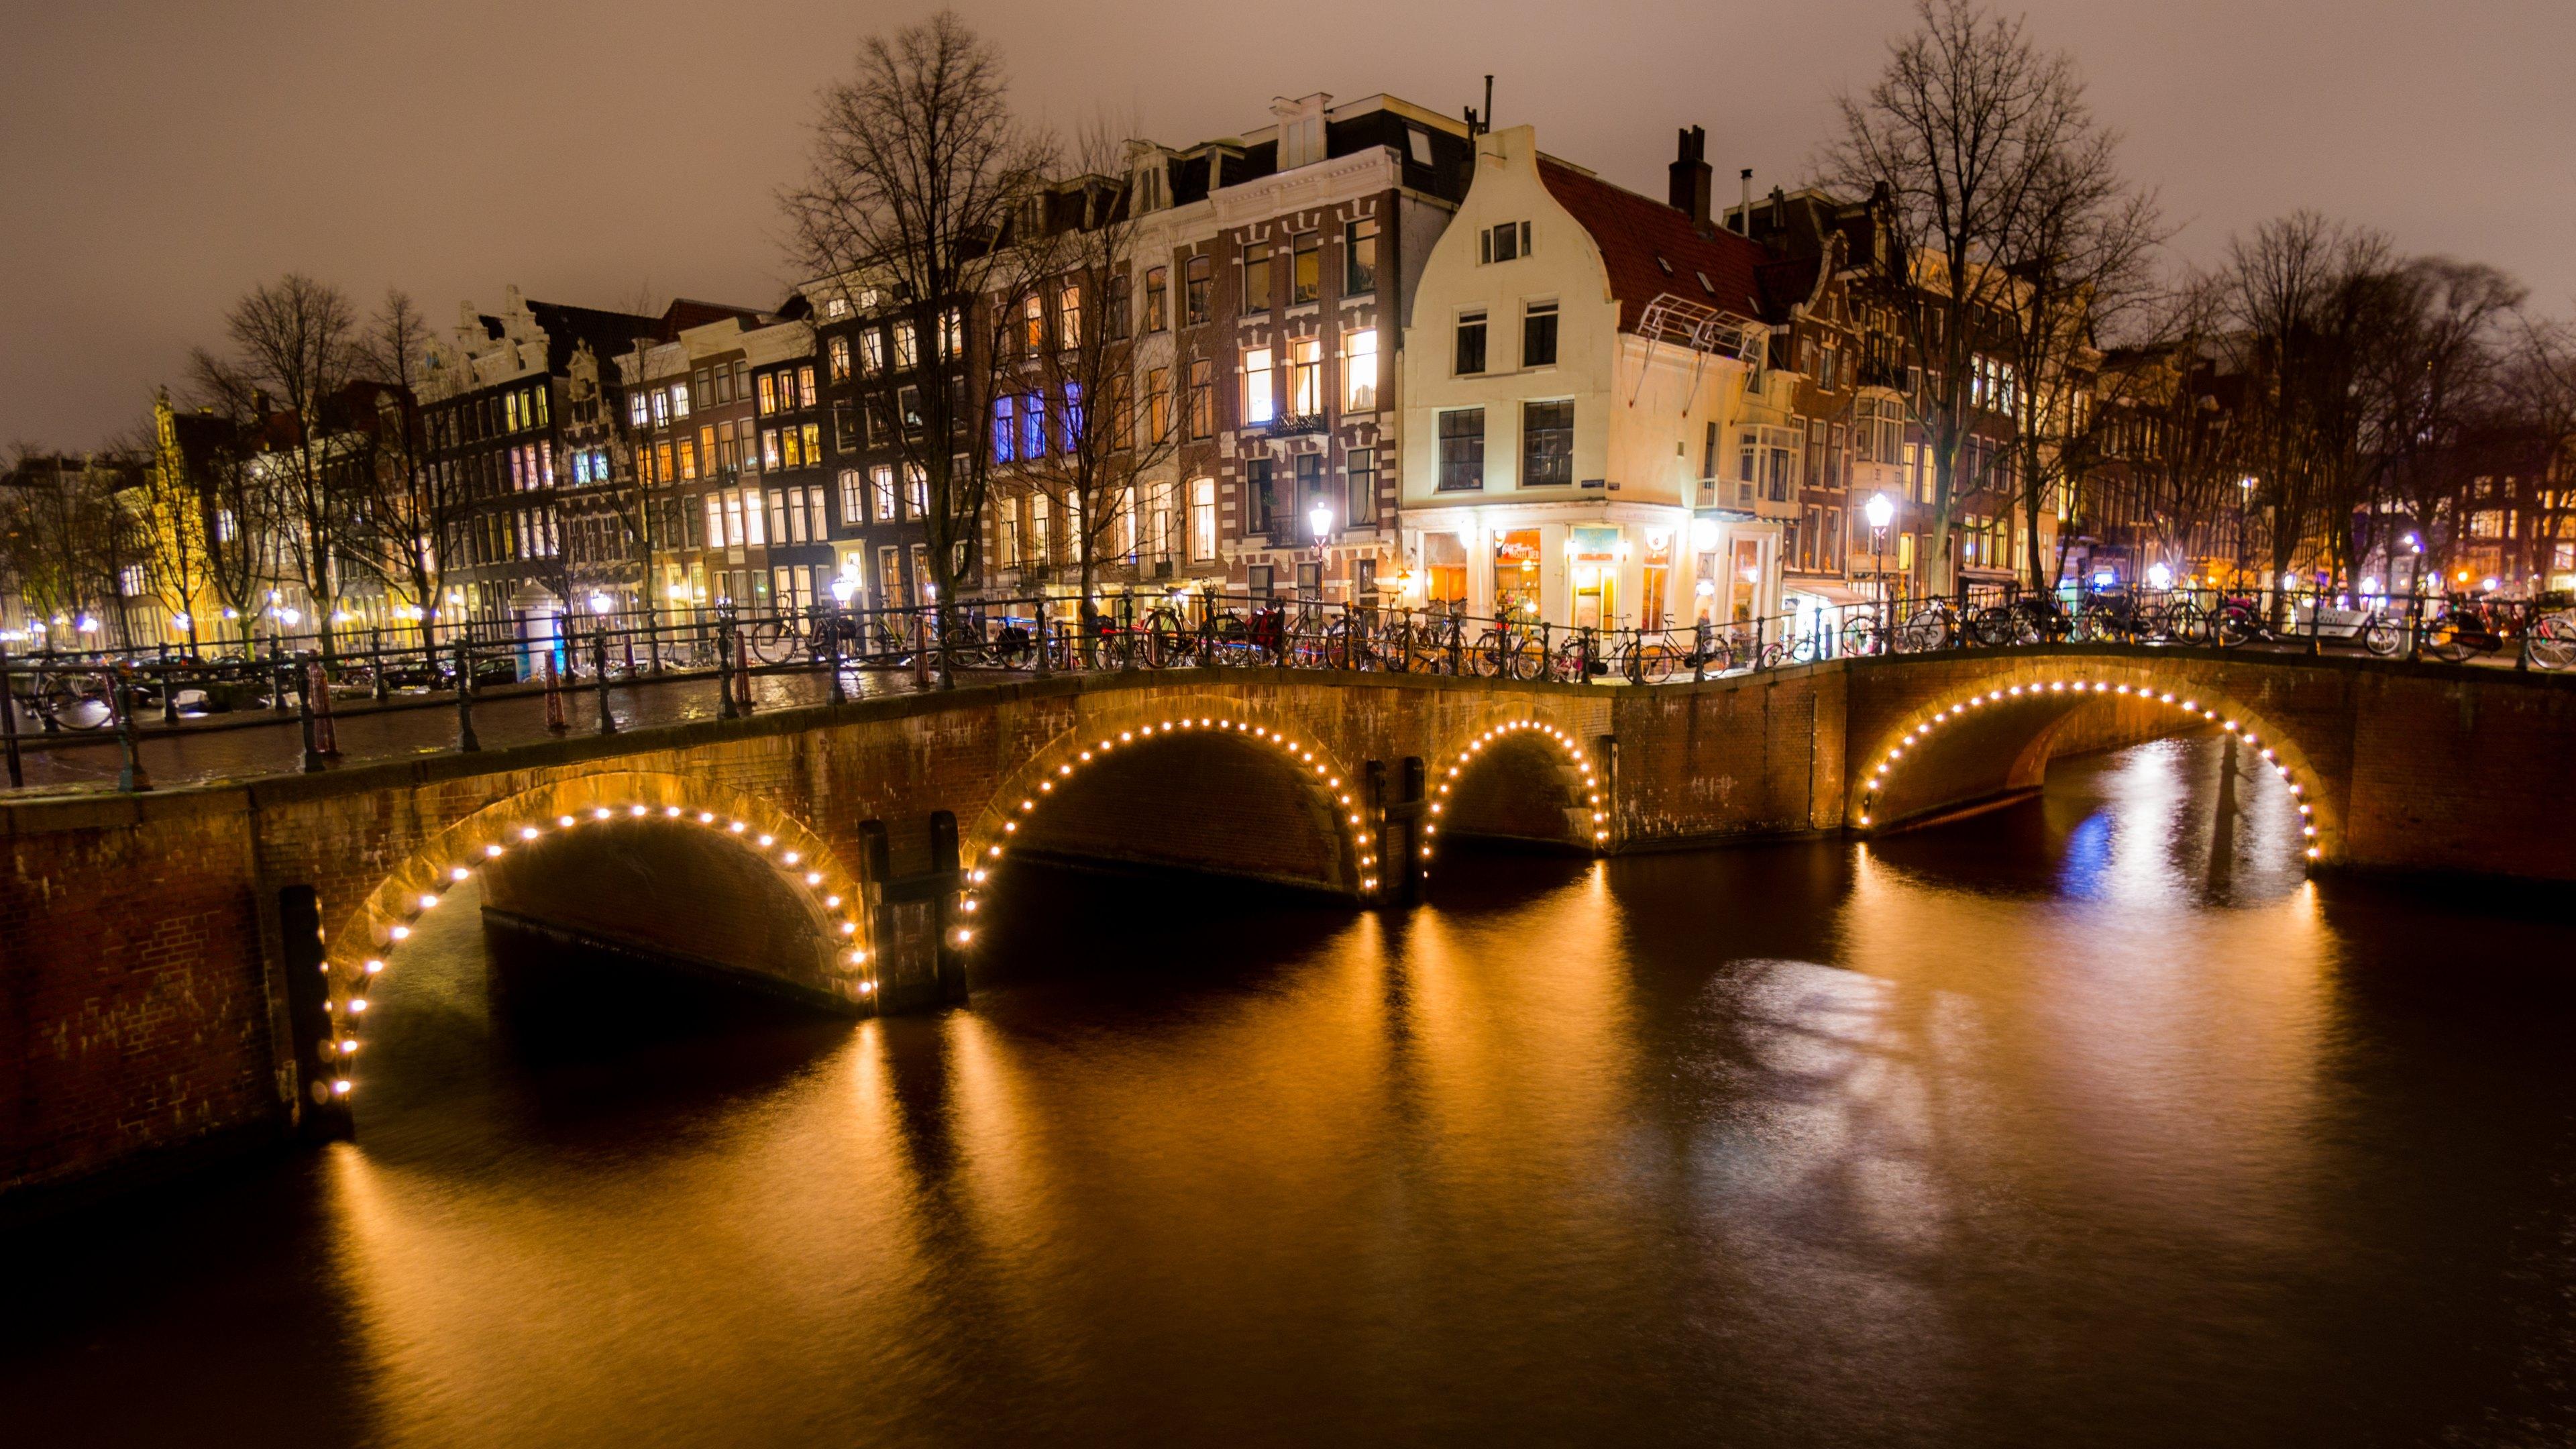 amsterdam netherlands hd wallpapers 4k